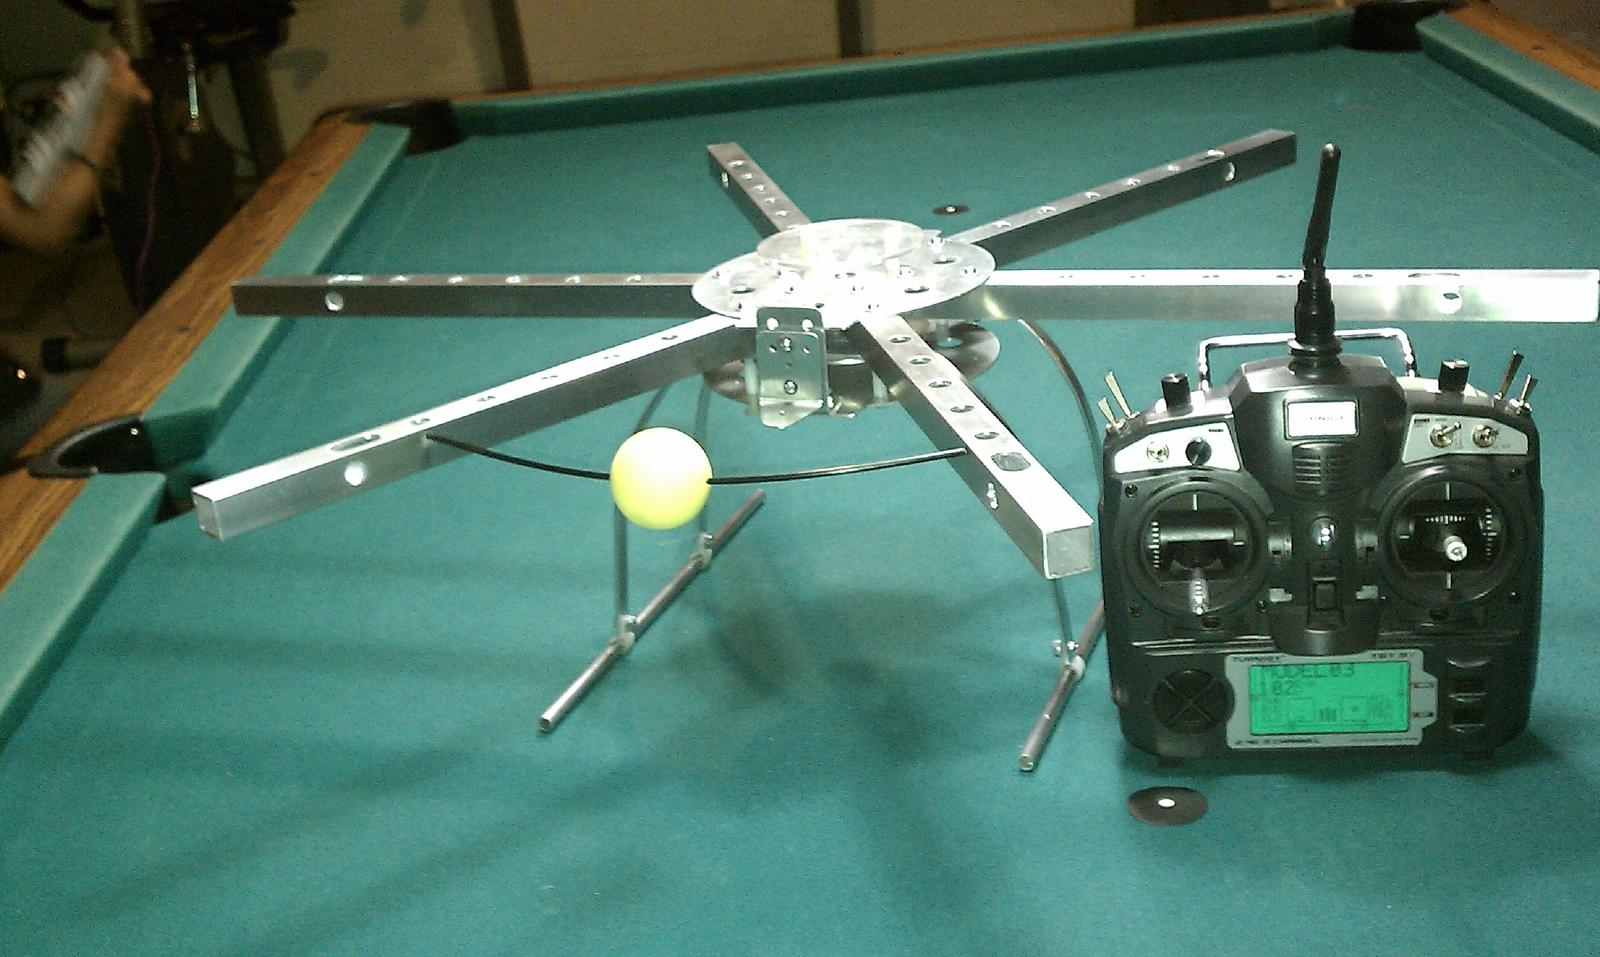 Hexacopter Build Plans